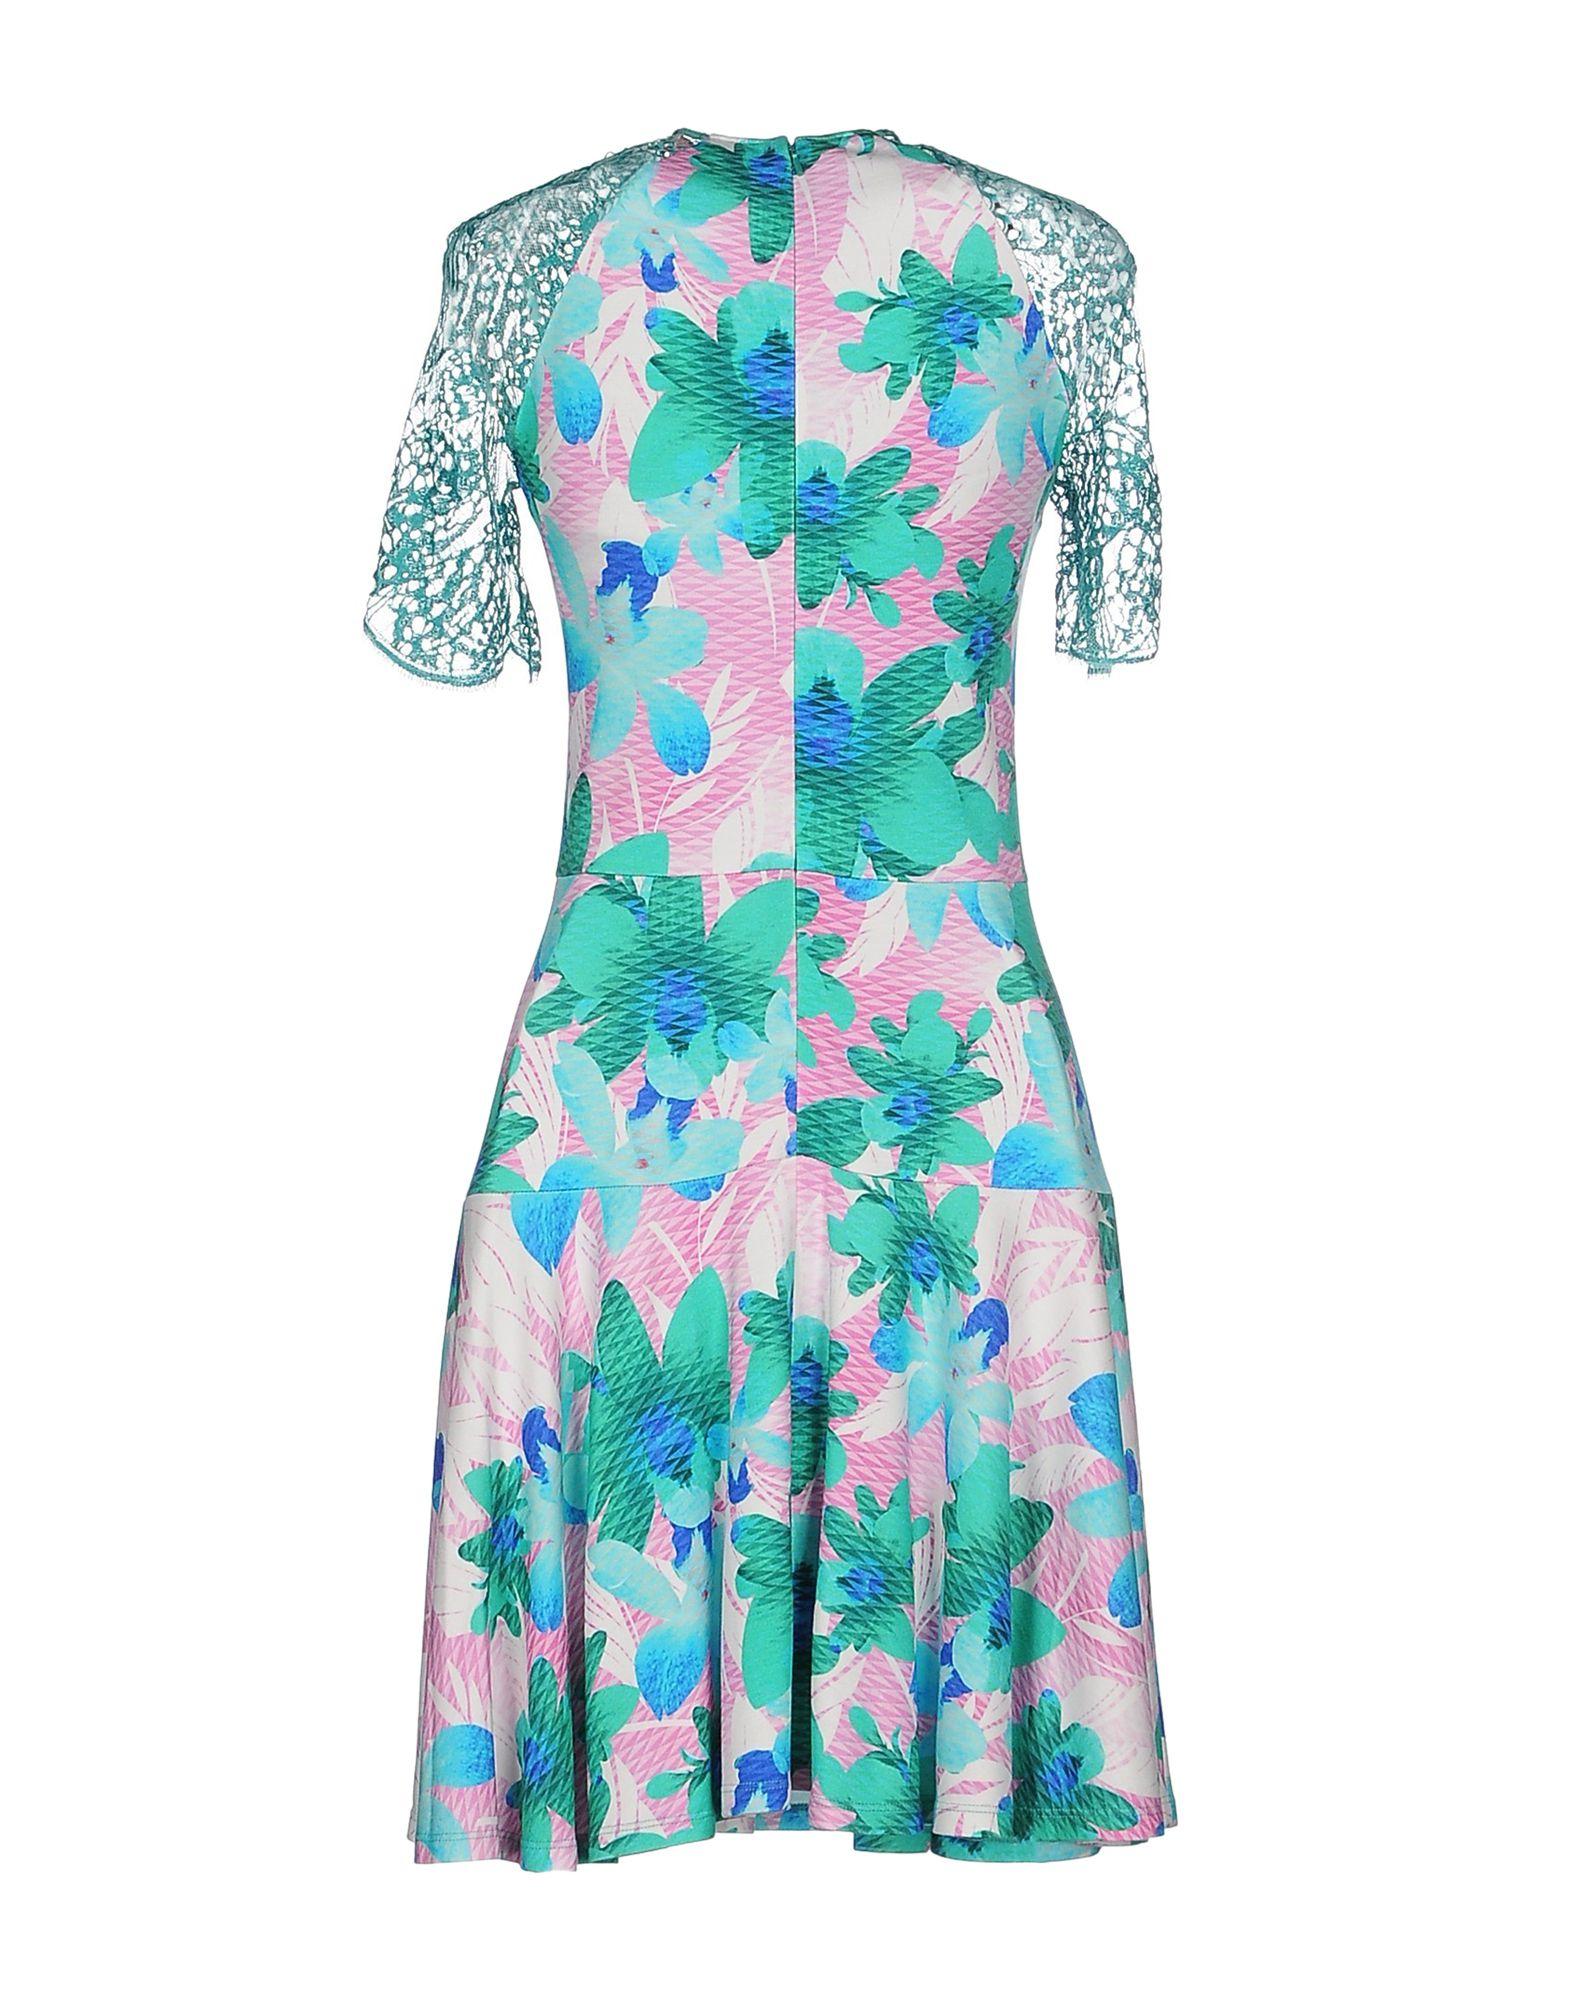 Matthew Williamson Woman Pompom-trimmed Printed Silk Mini Dress Turquoise Size 6 Matthew Williamson Pictures Online g8dJbCP6Ae